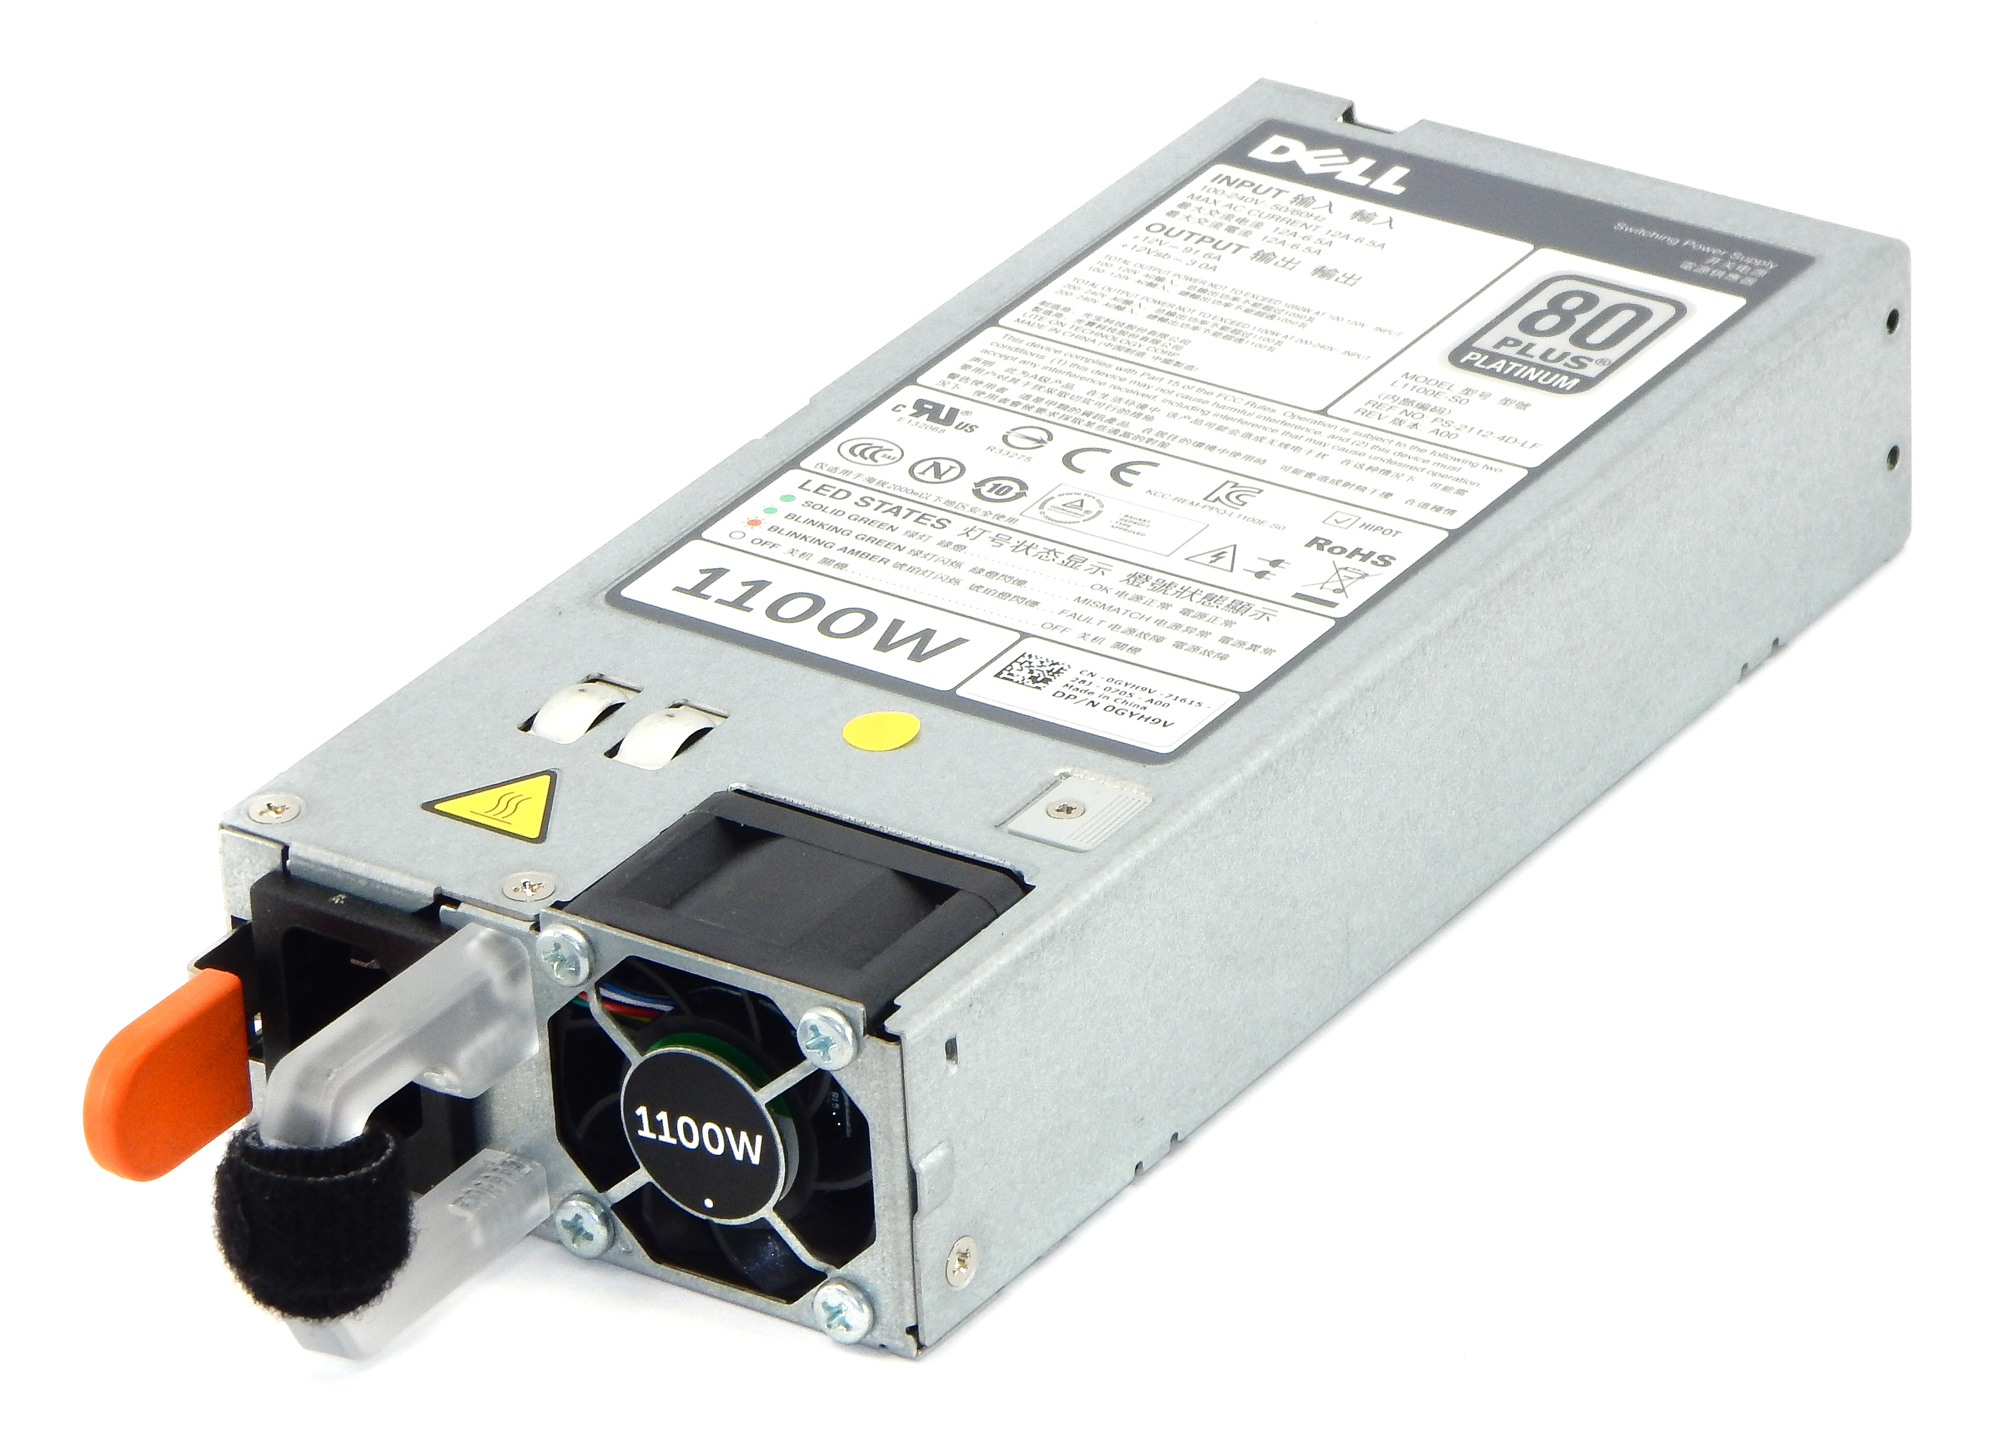 Dell GYH9V PowerEdge R720 R820 Switching Power Suplly 1100W PSU